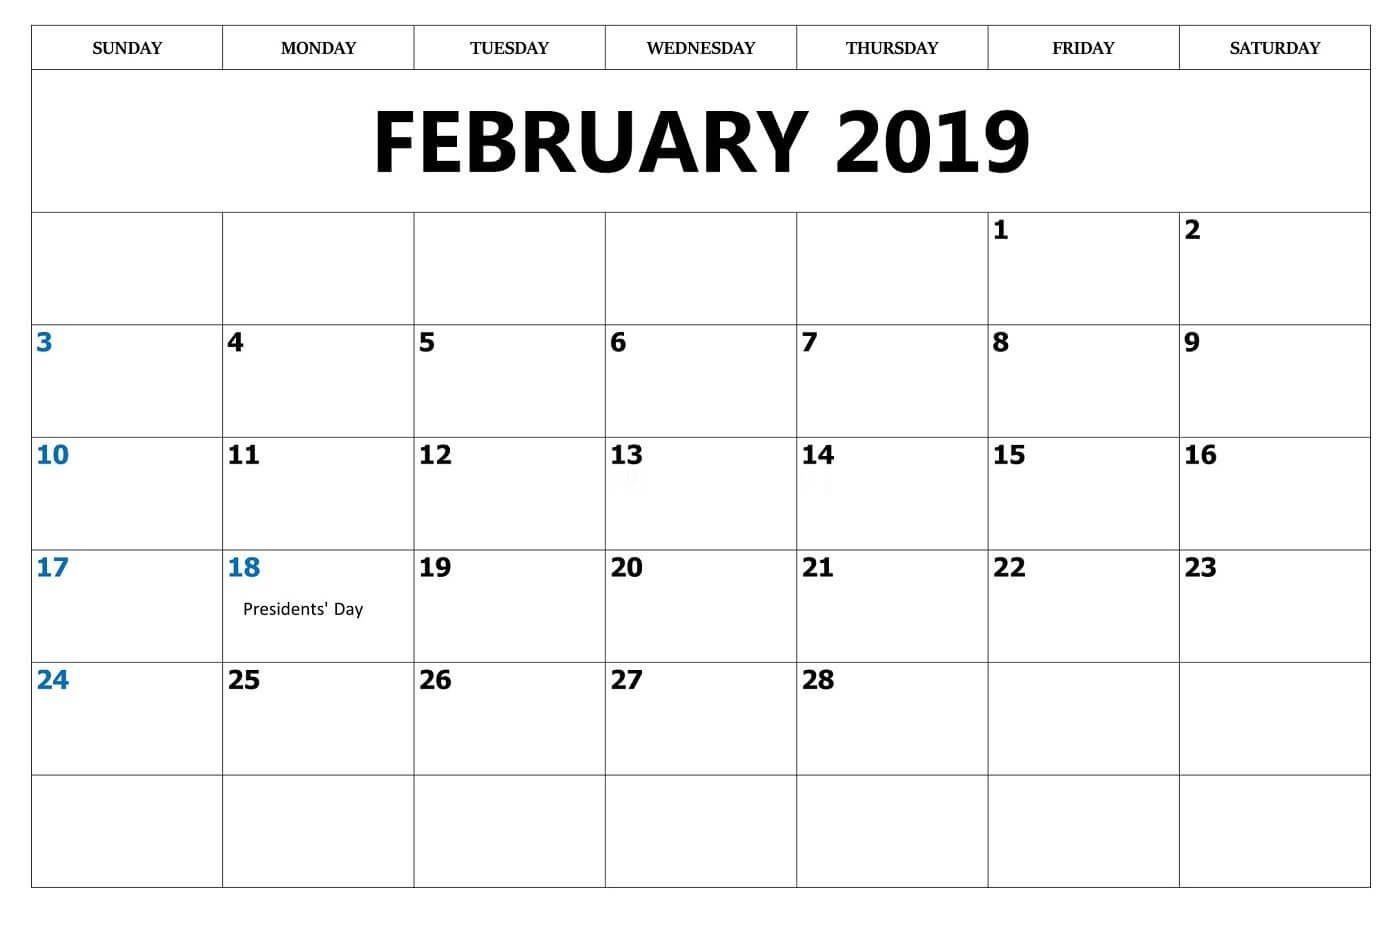 Calendar For February 2019 With Holidays February 2019 Calendar With Holidays | 125+ February 2019 Calendar